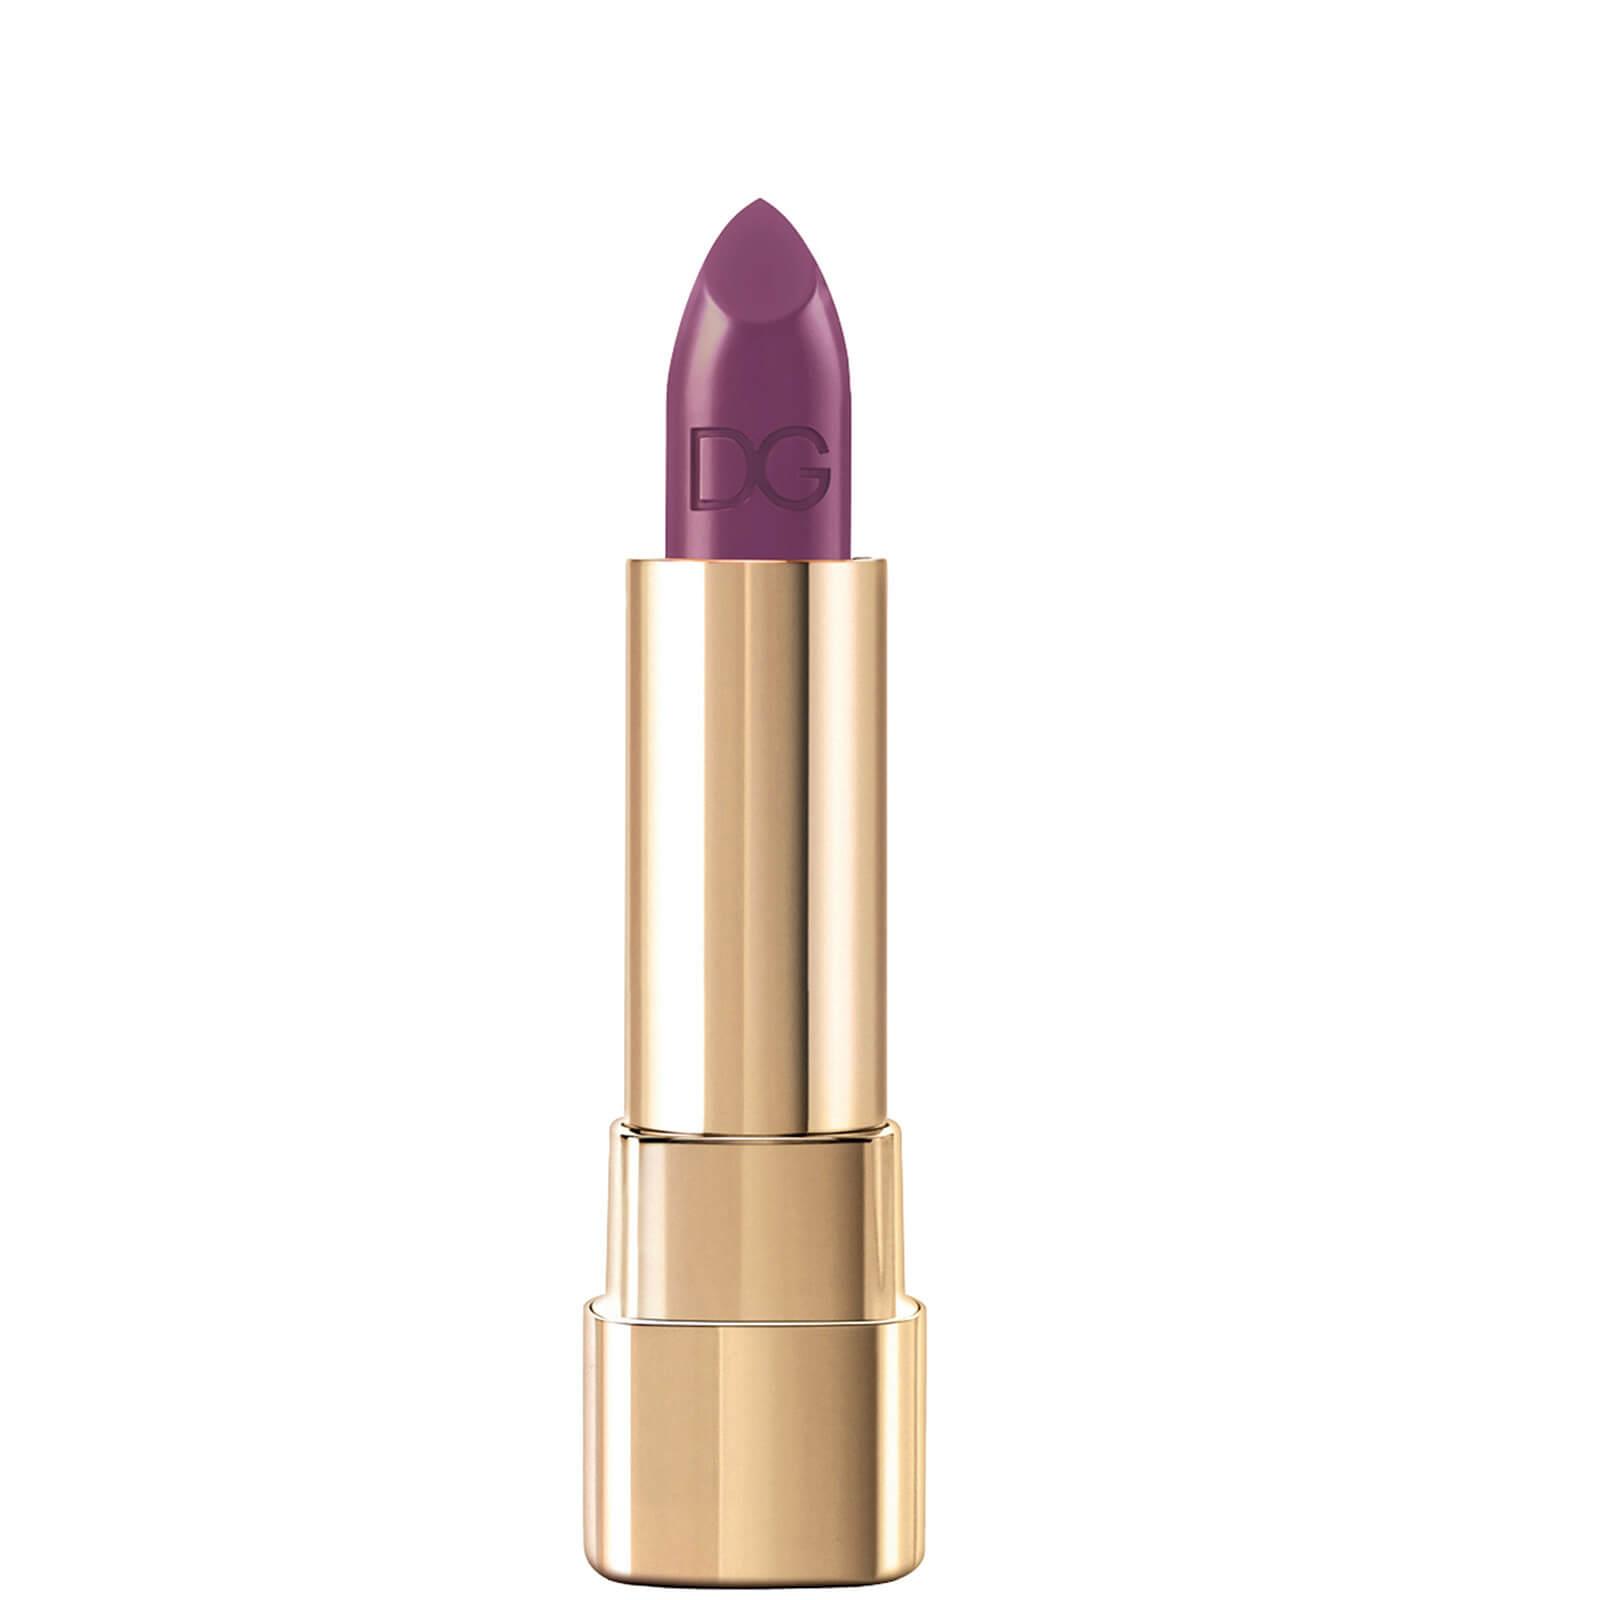 Dolce&Gabbana Classic Cream Lipstick 3.5g (Various Shades) - 315 Risky